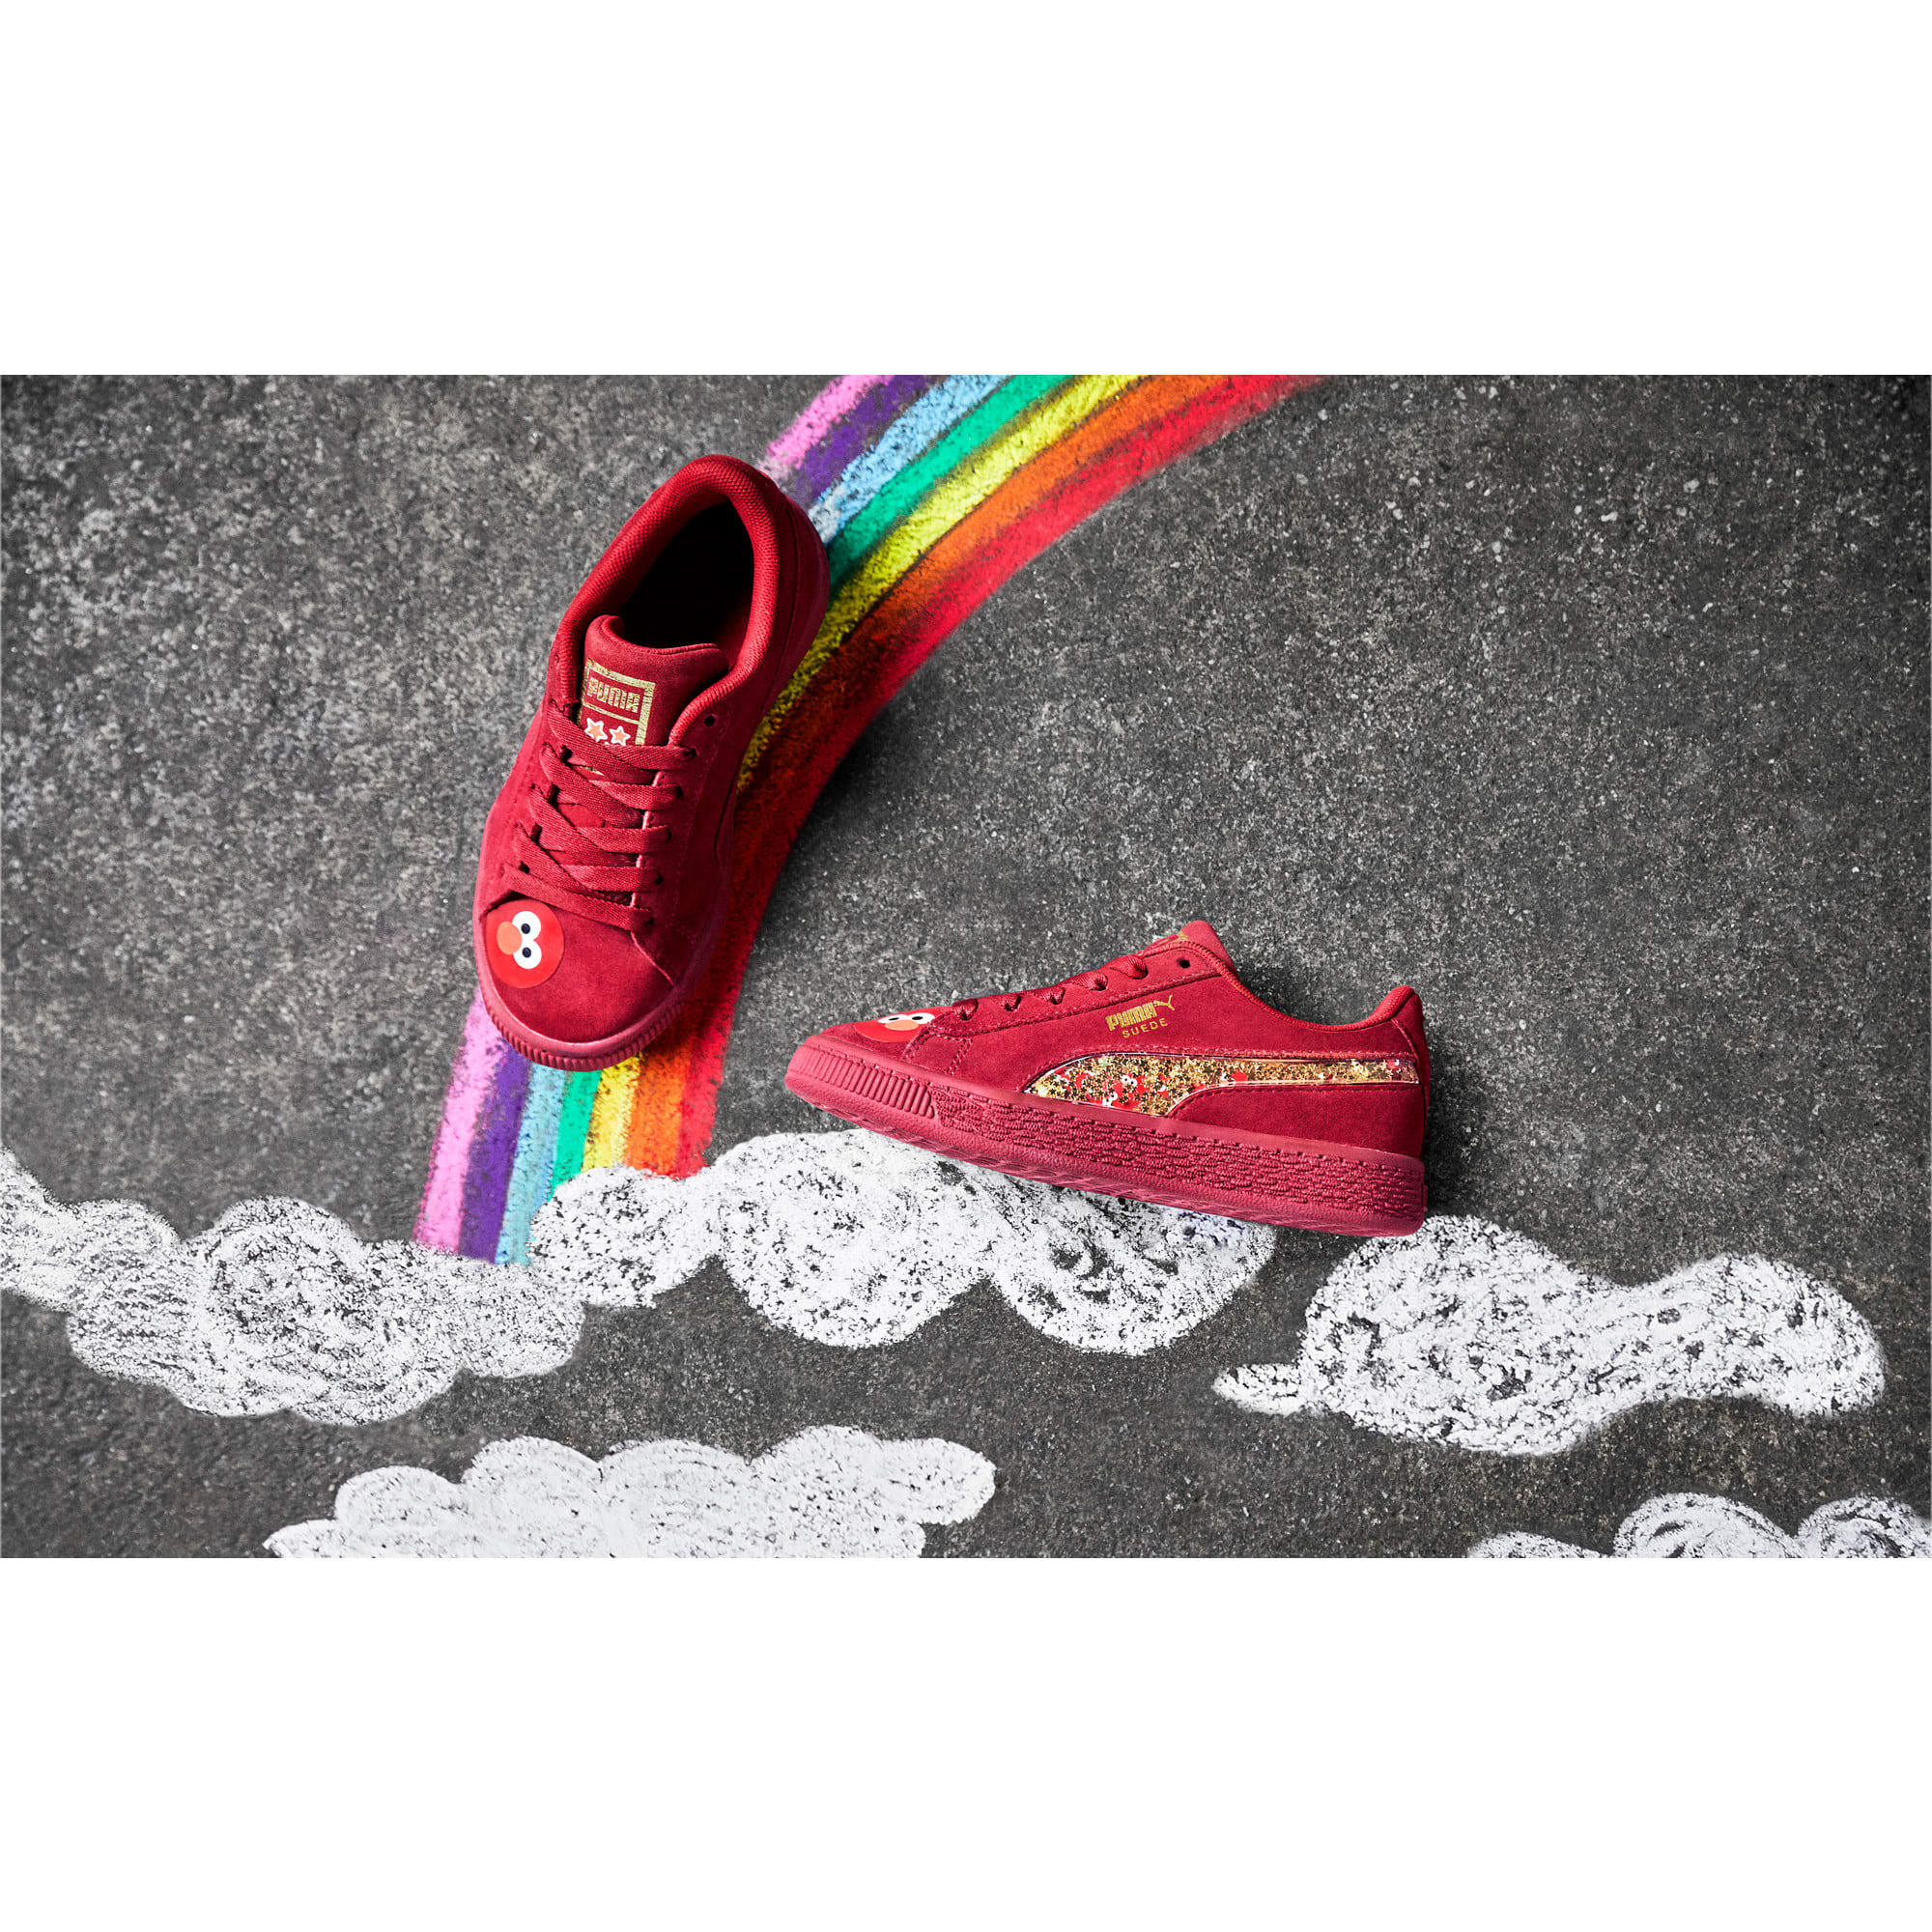 Thumbnail 9 of PUMA x SESAME STREET 50 Suede Statement Little Kids' Shoes, Rhubarb-Puma White, medium